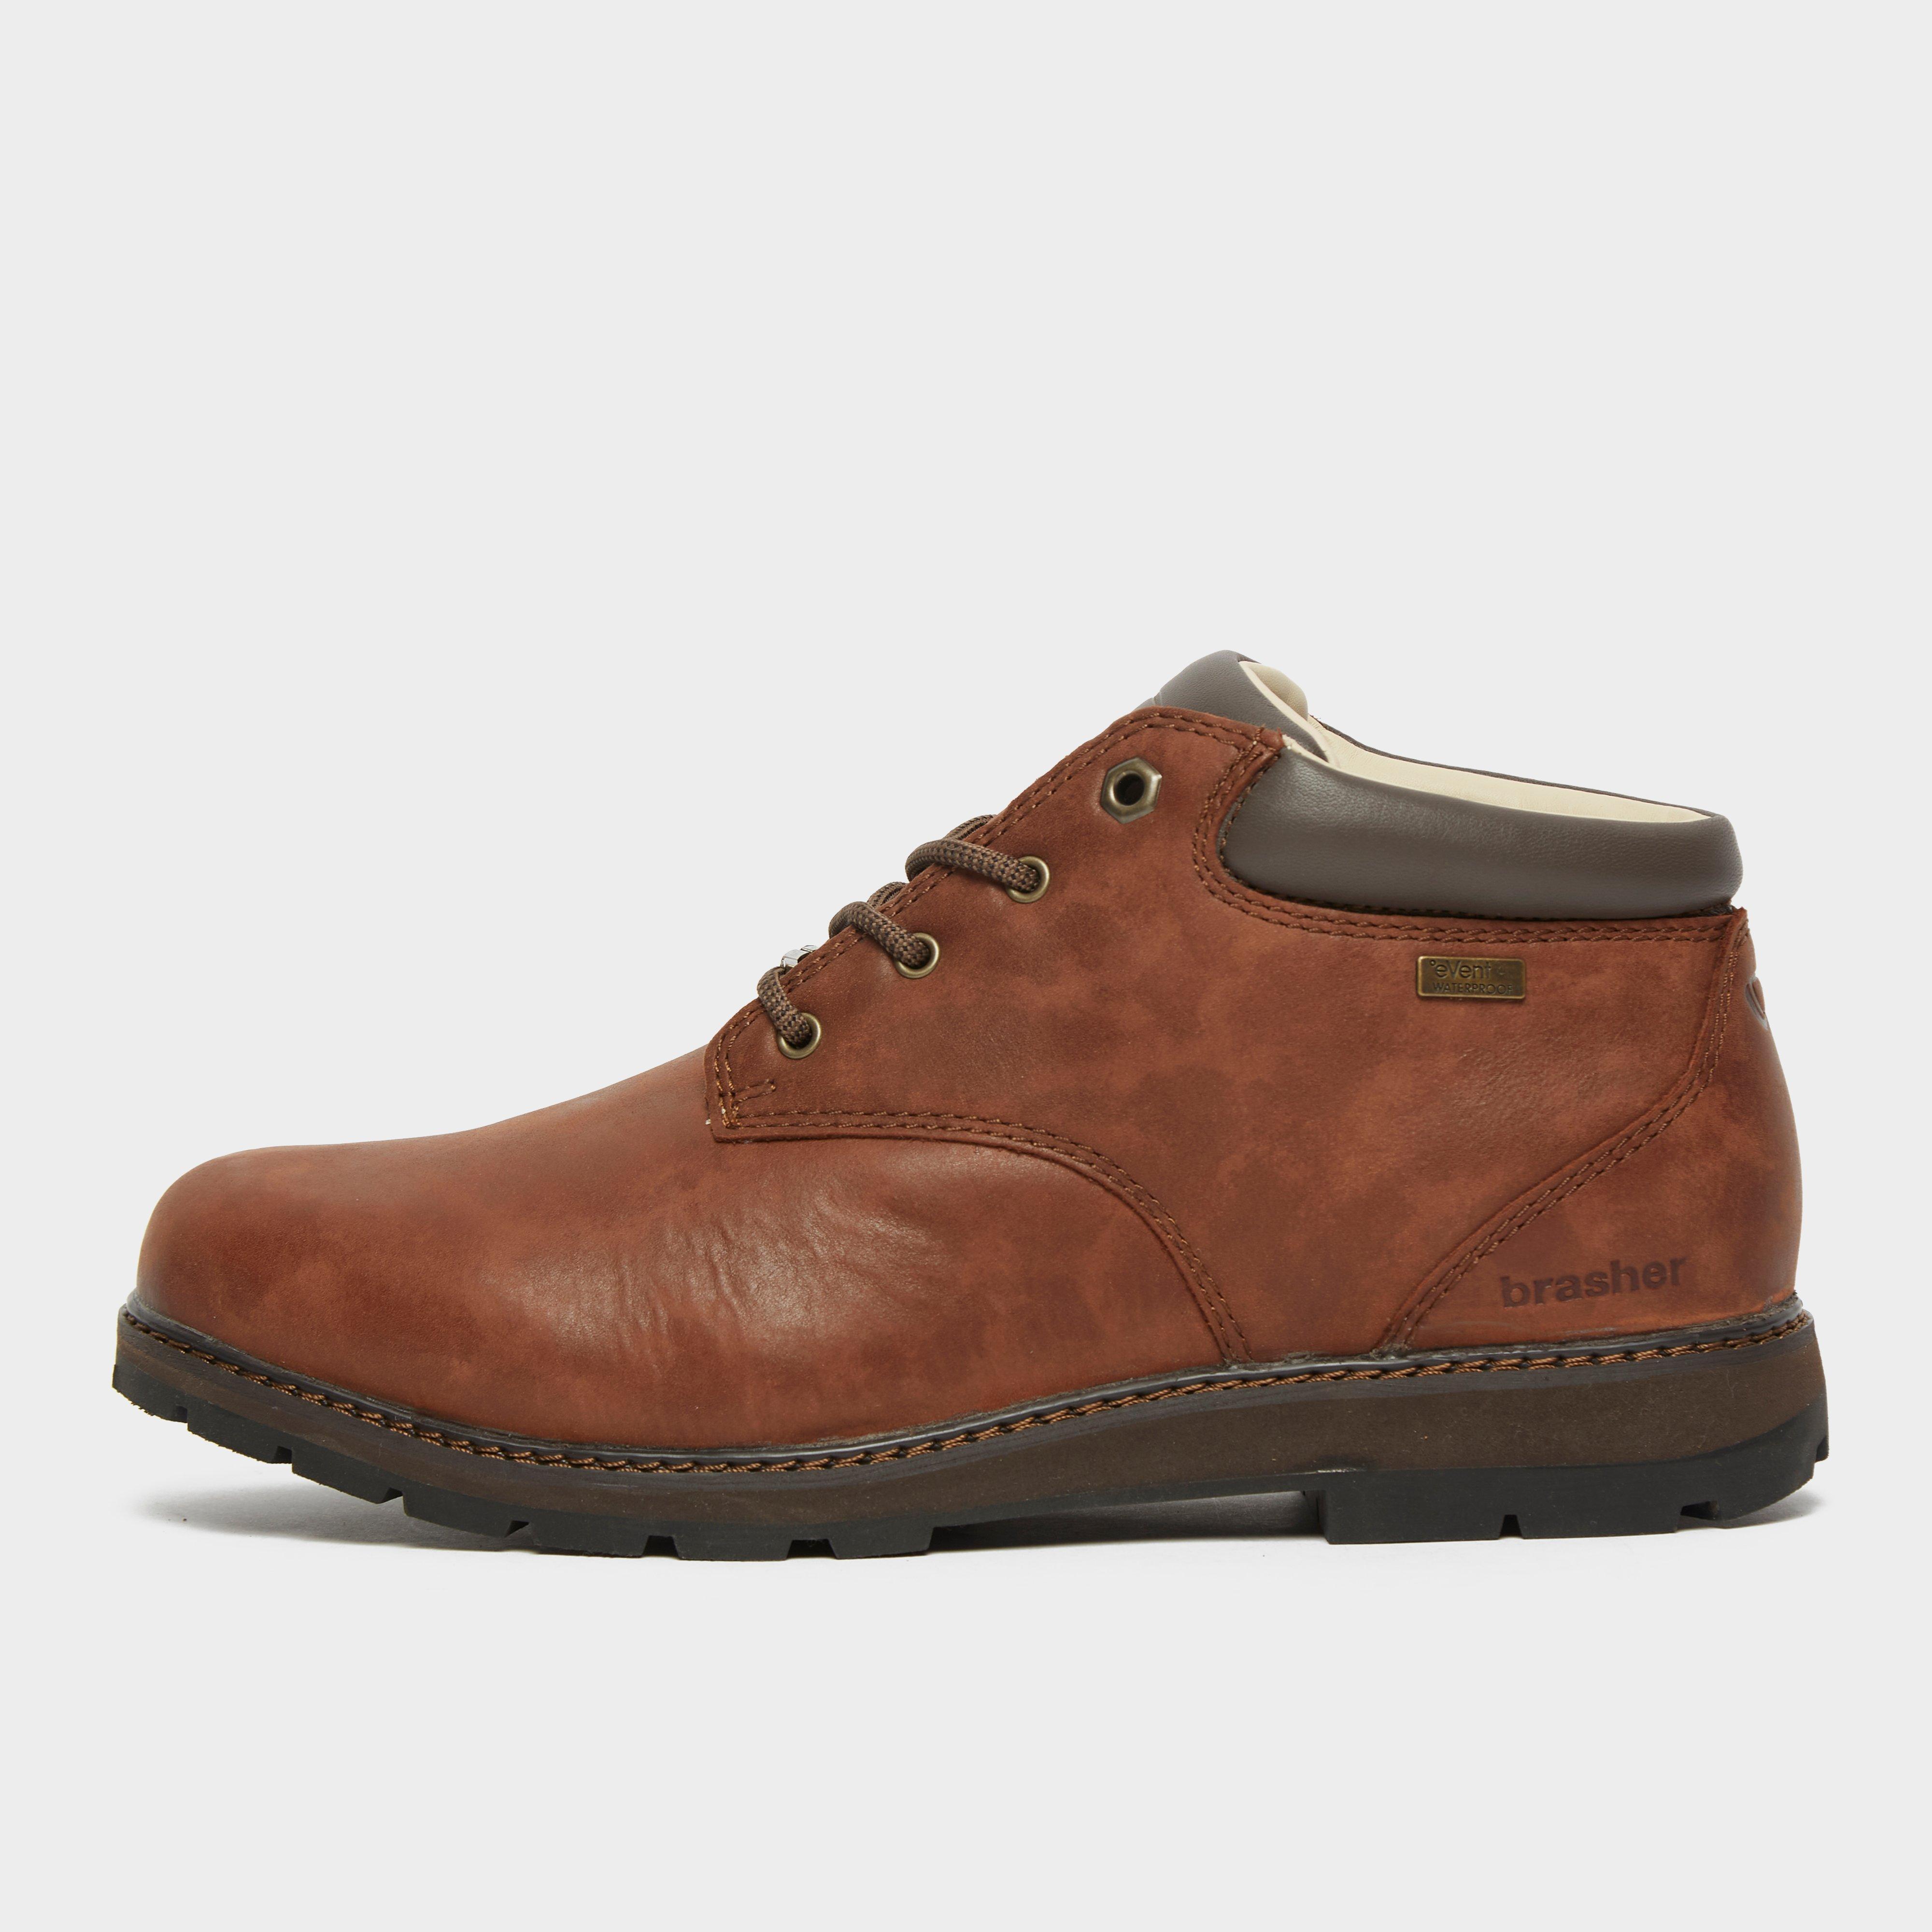 Brasher Mens Country Traveller Walking Shoes - Brown/brn  Brown/brn